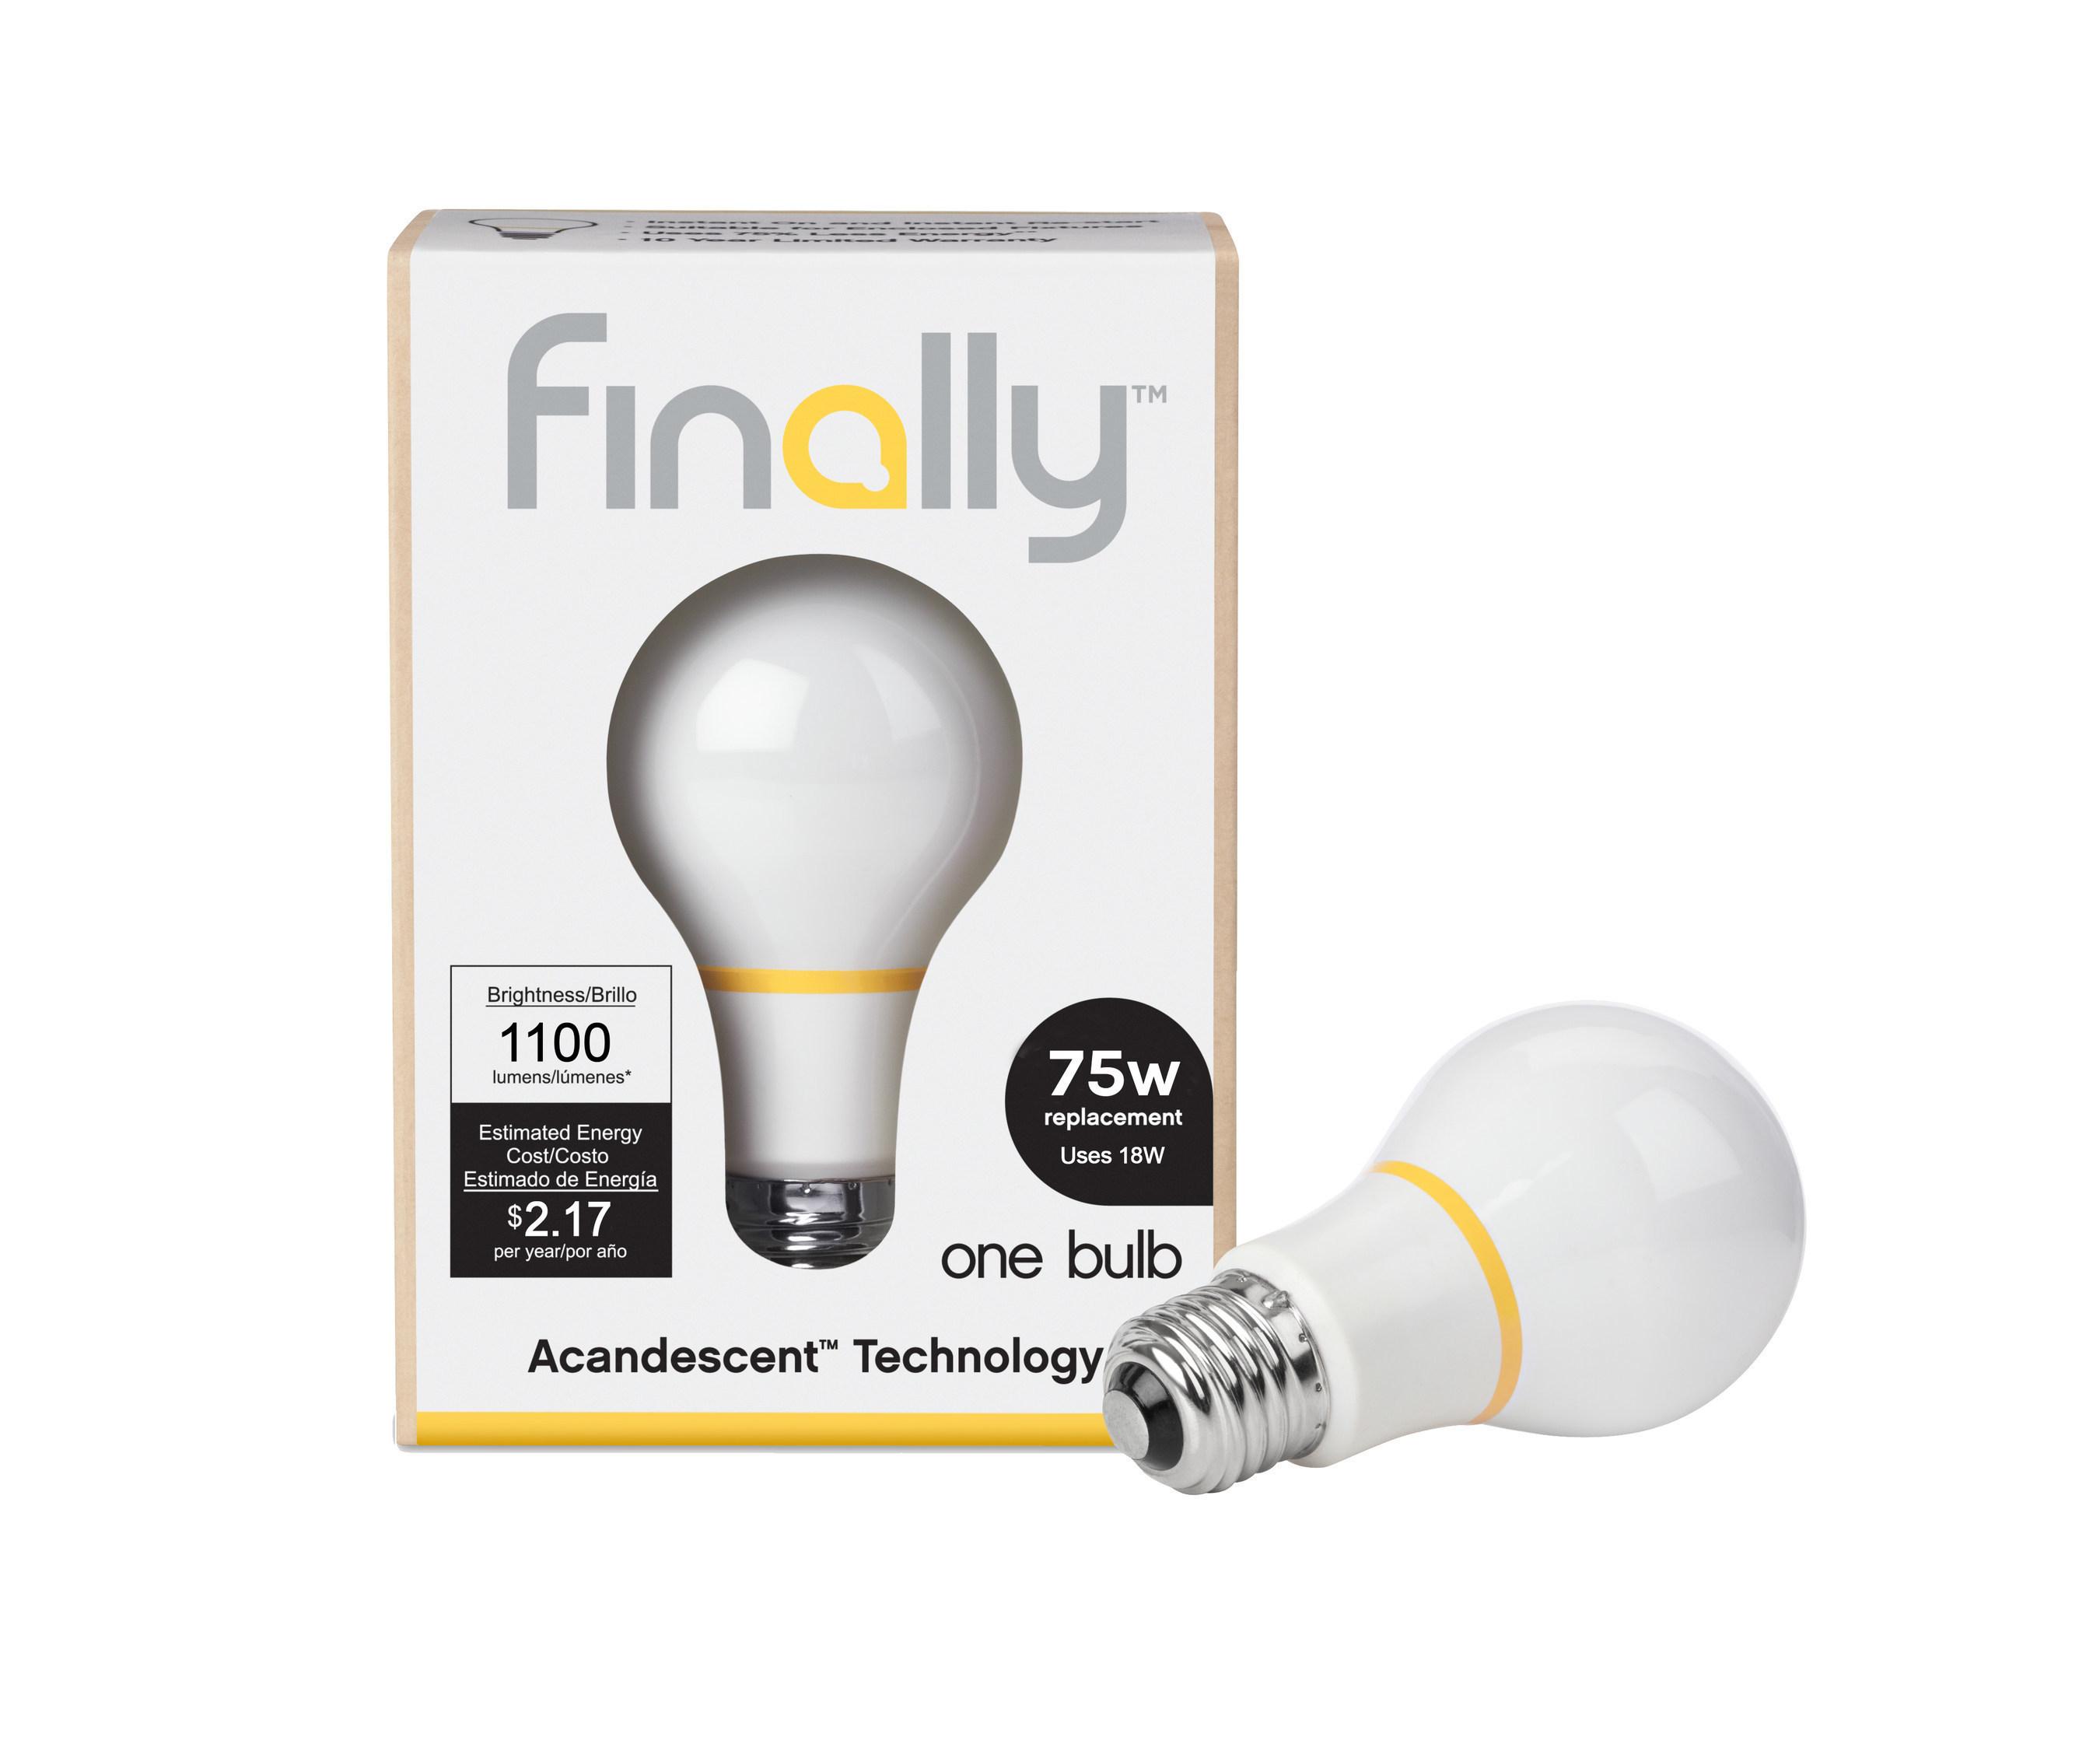 The Finally Light Bulb company manufactures energy-efficient light bulbs with a new technology, Acandescence. Bulbs are currently available in 60 Watt, 75 Watt and 100 Watt